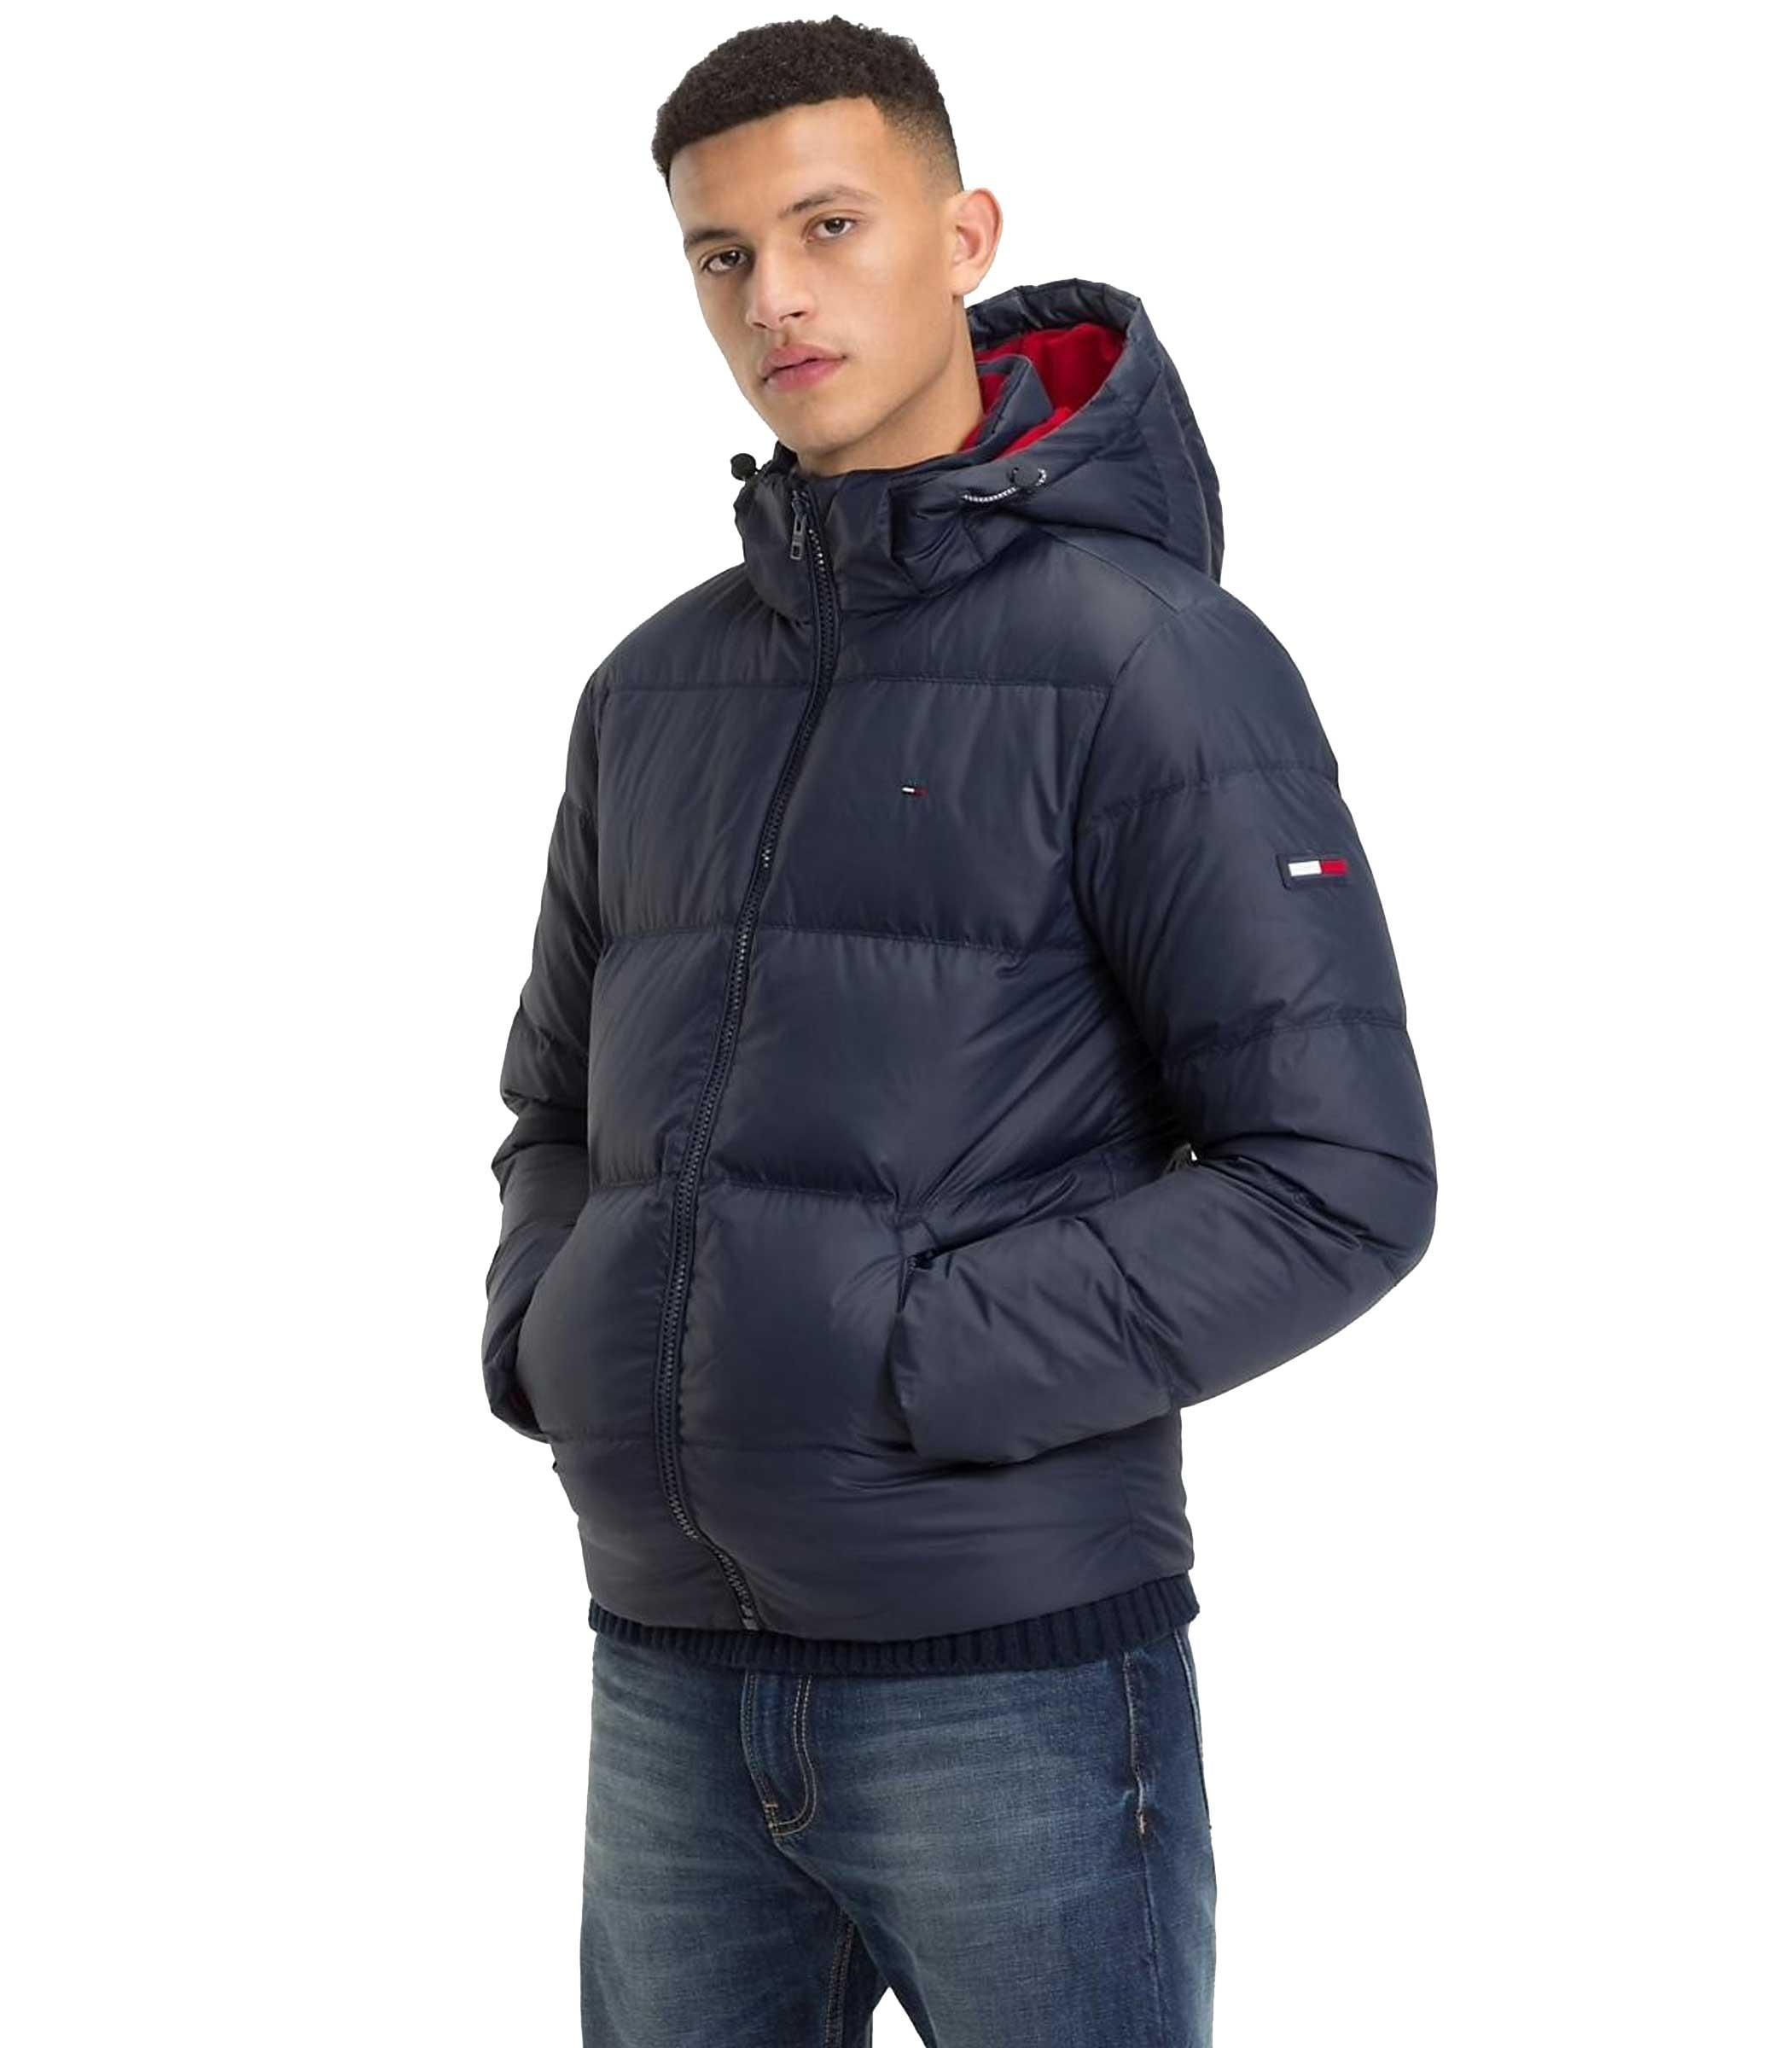 Giubbotto Tommy Jeans Hooded Parka Jacket da uomo rif. DM0DM04998 b3d7a287012